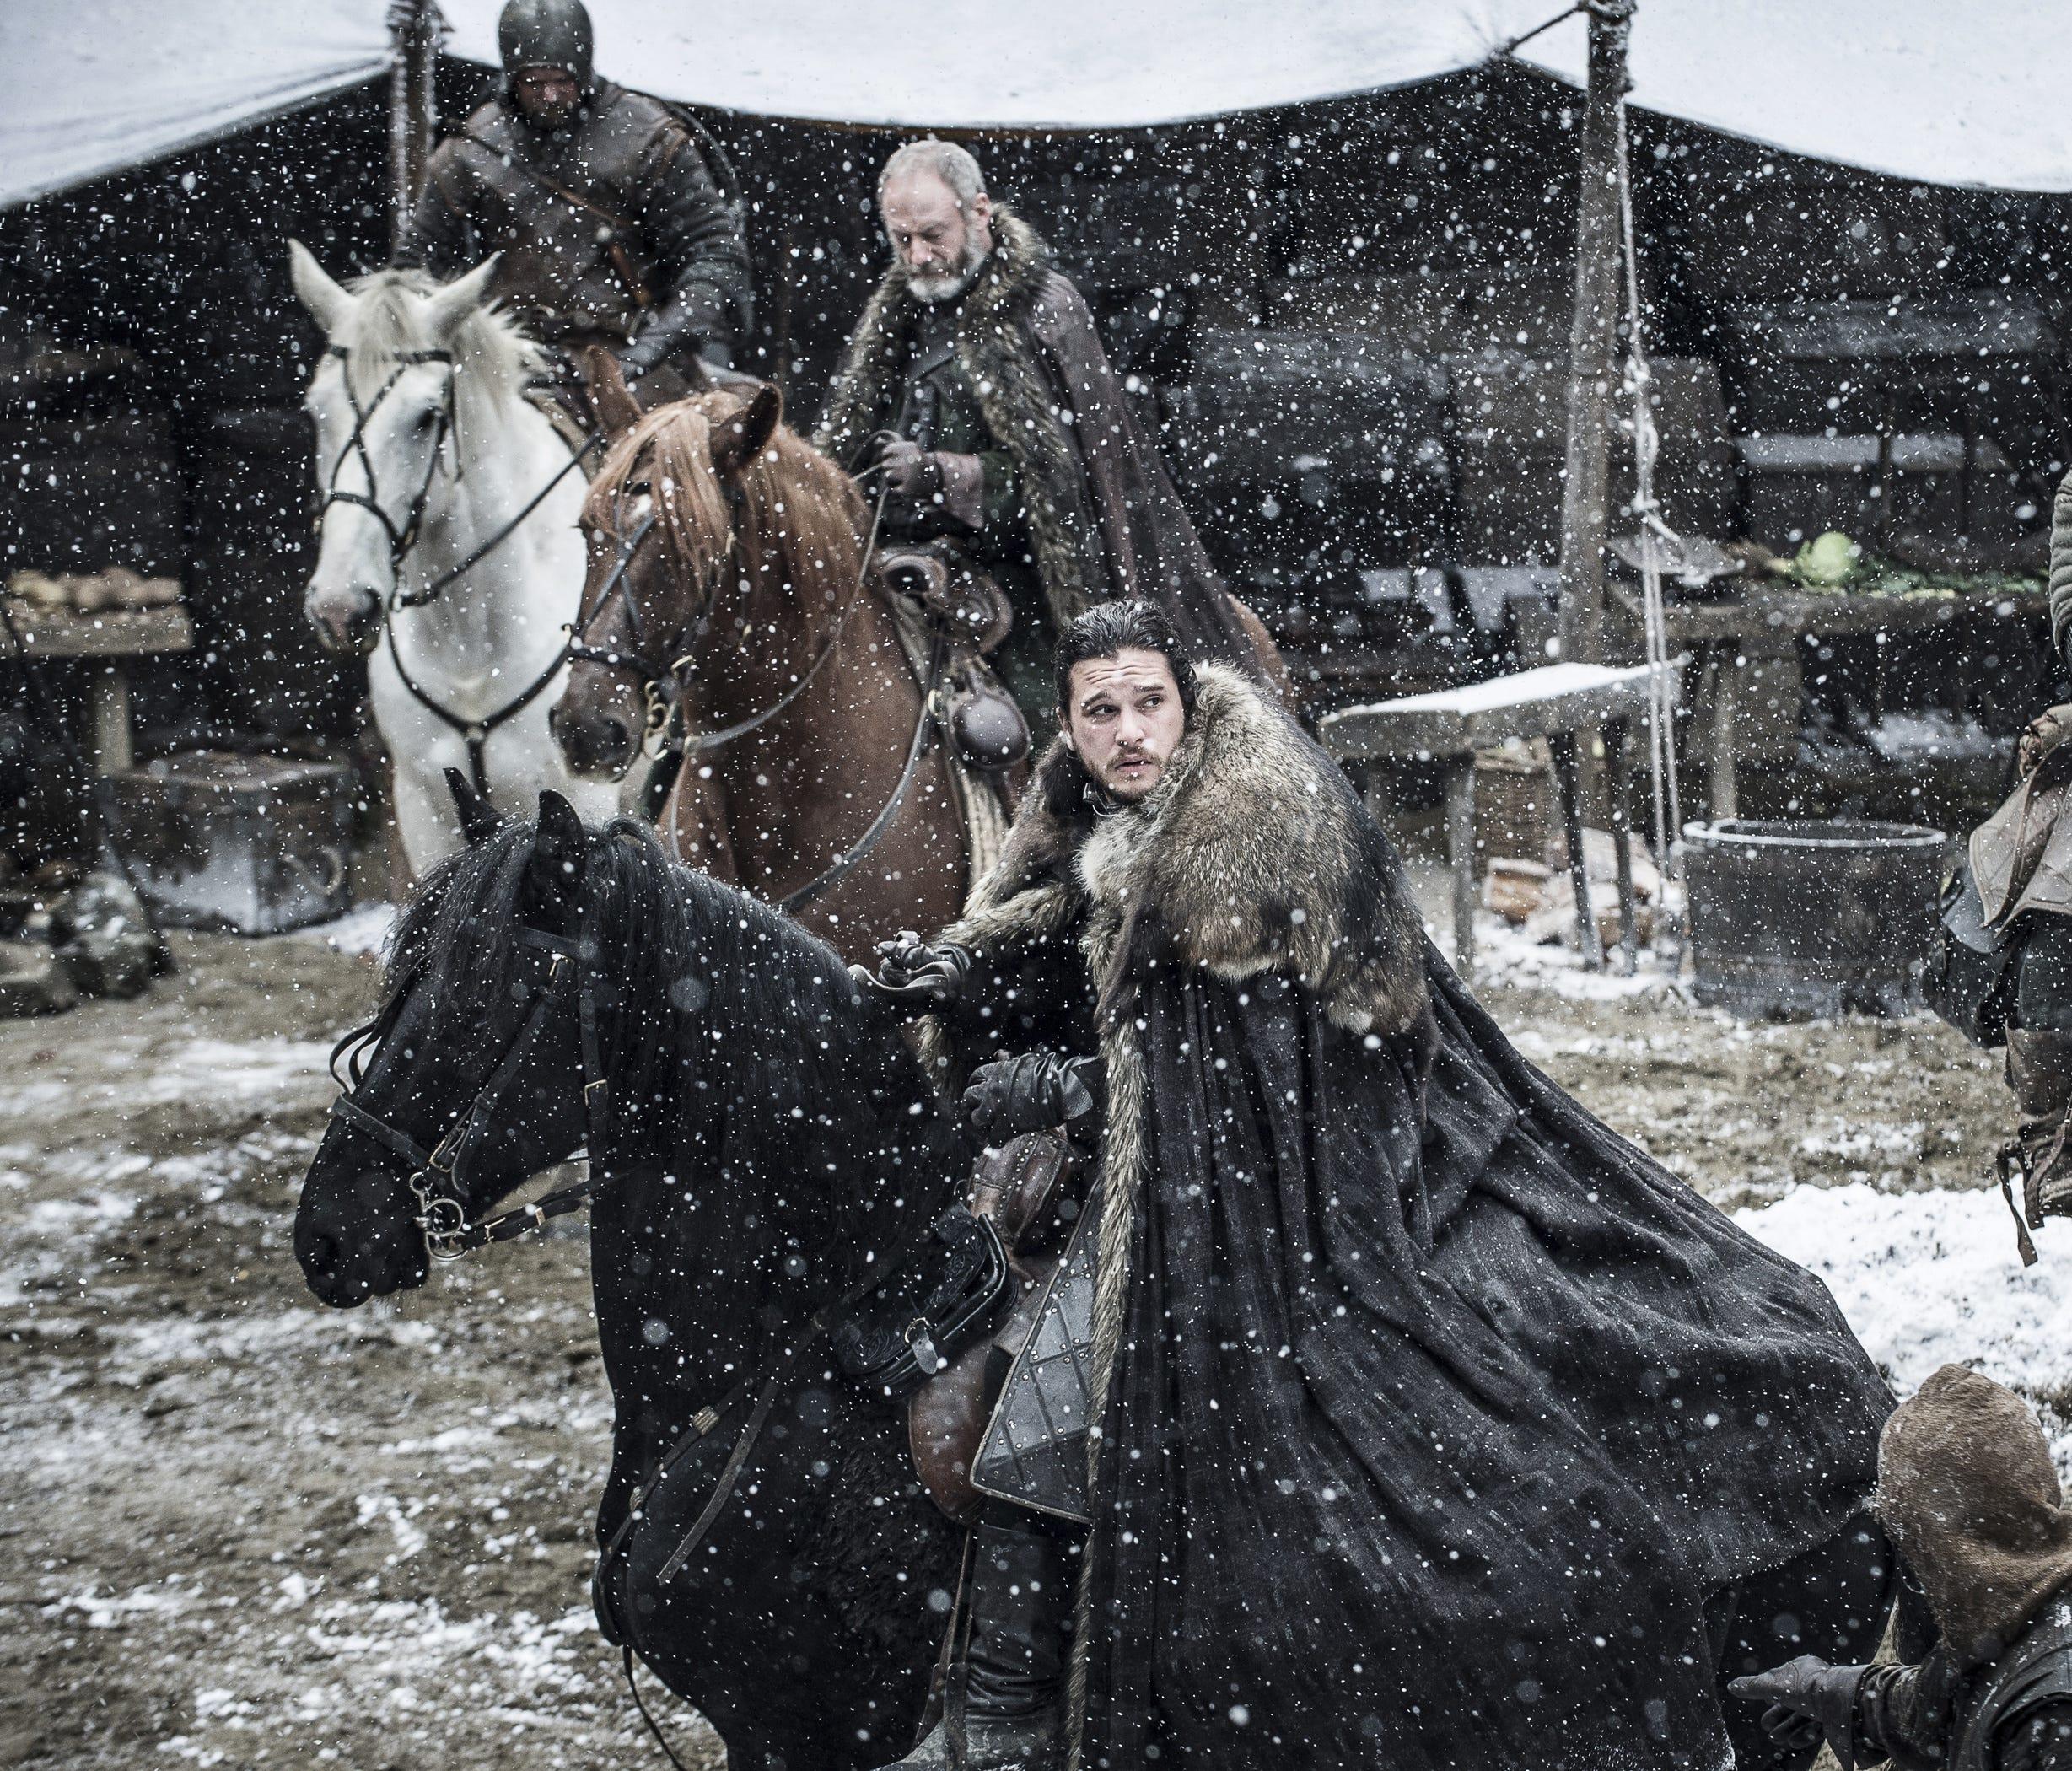 Jon and Davos